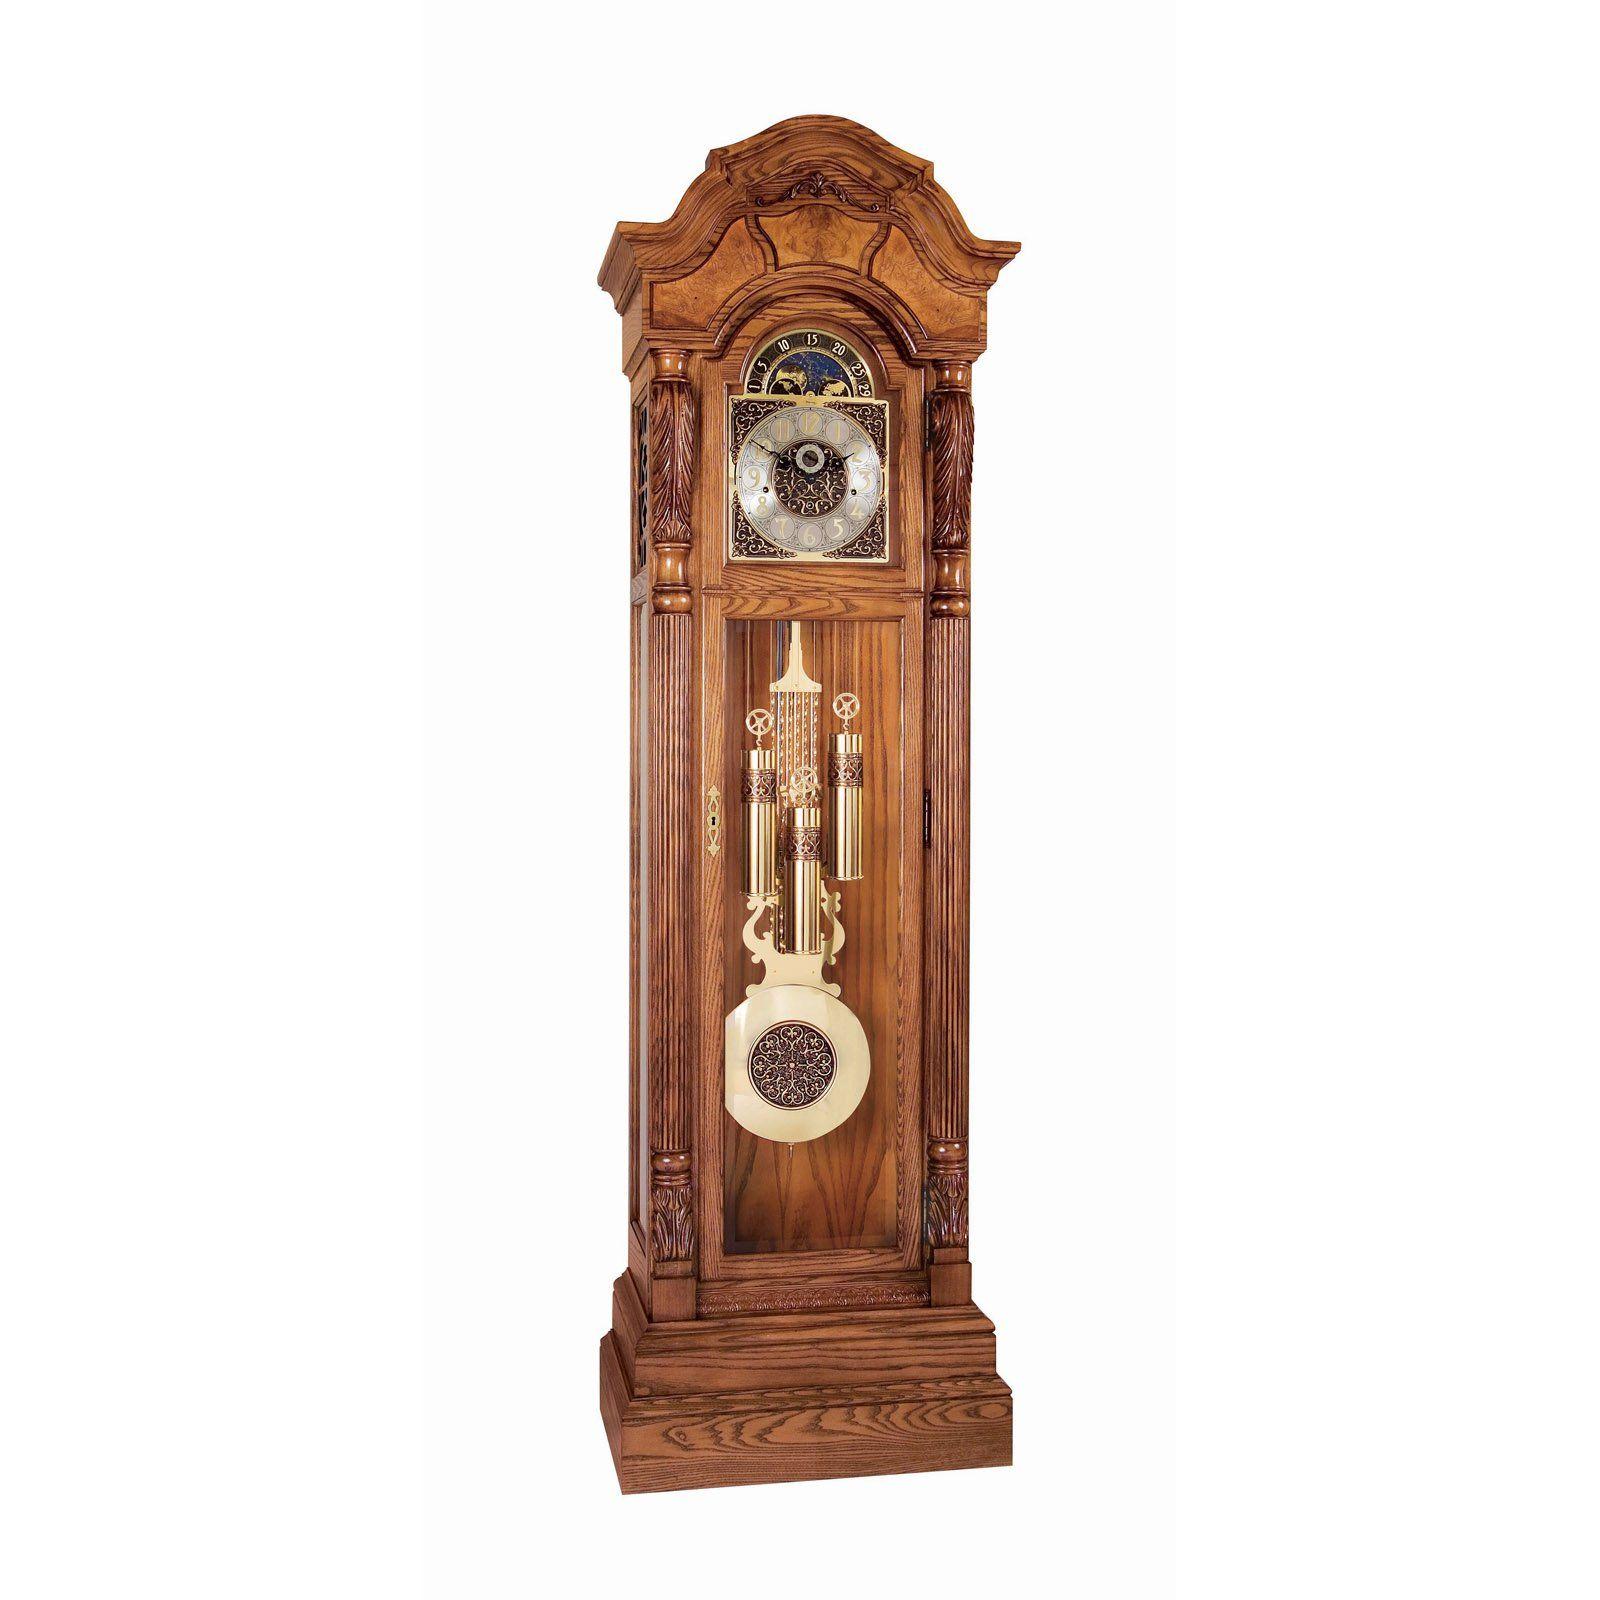 Ridgeway mantel clock value